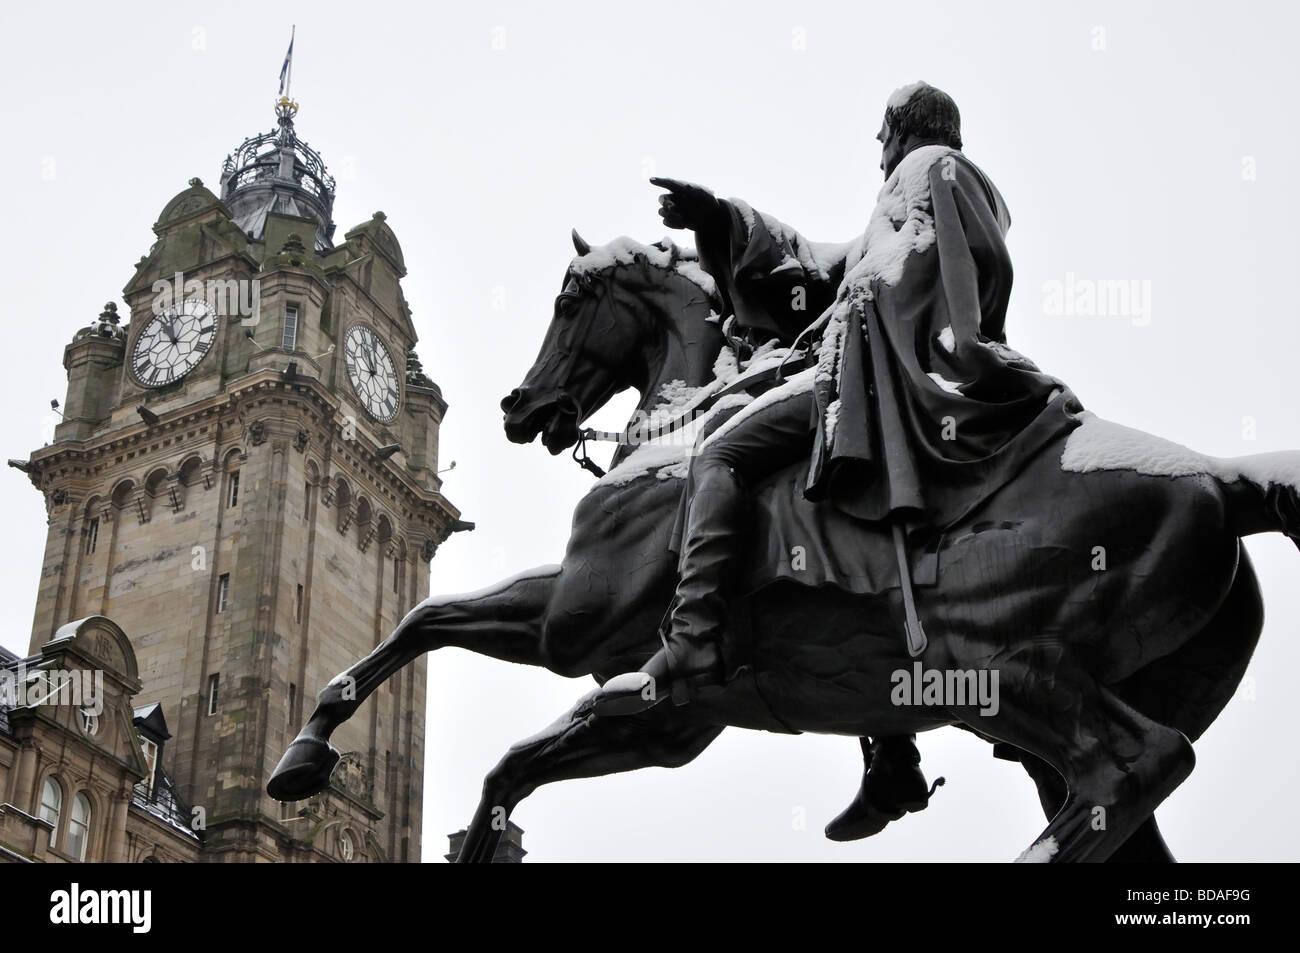 Statue of the Duke of Wellington and the tower of the Balmoral Hotel, Edinburgh, Scotland, UK. - Stock Image